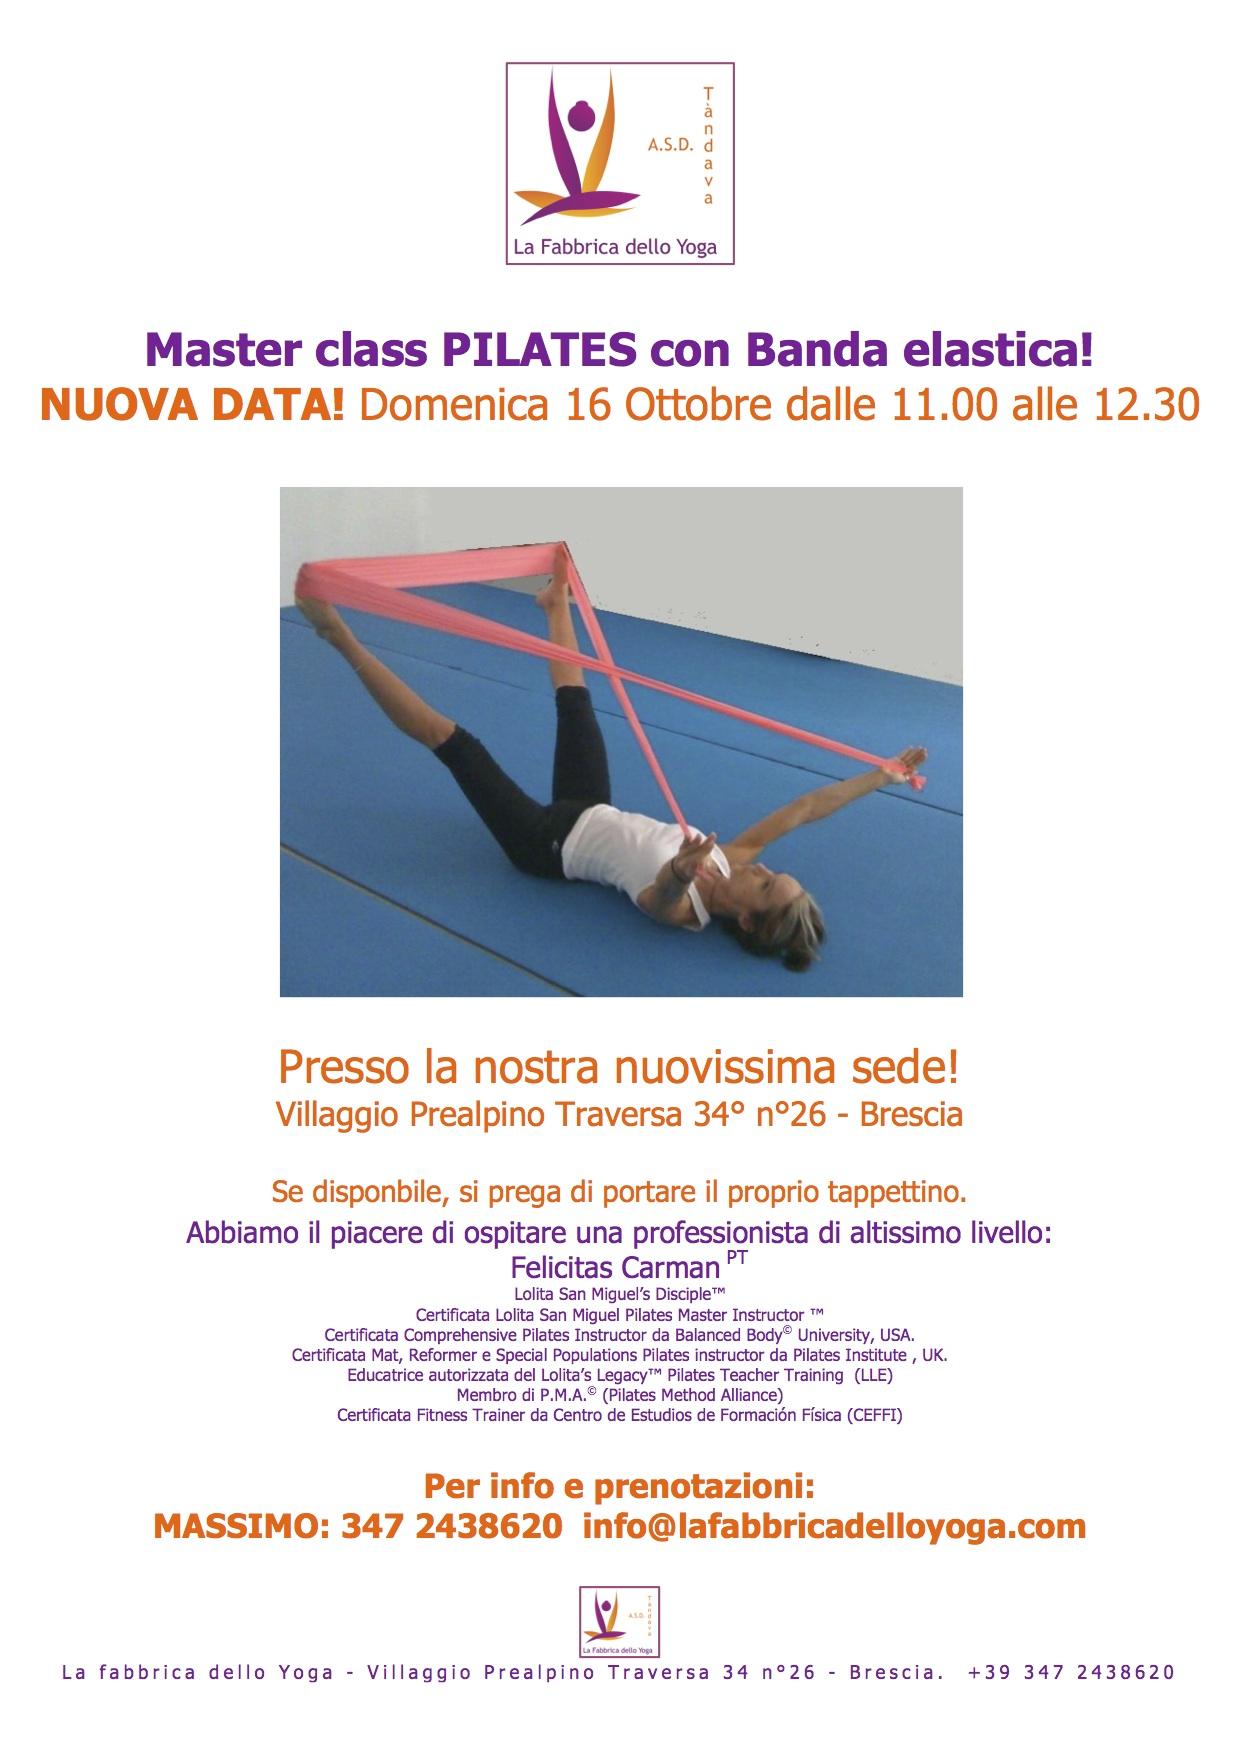 locandina-pilates-16102016